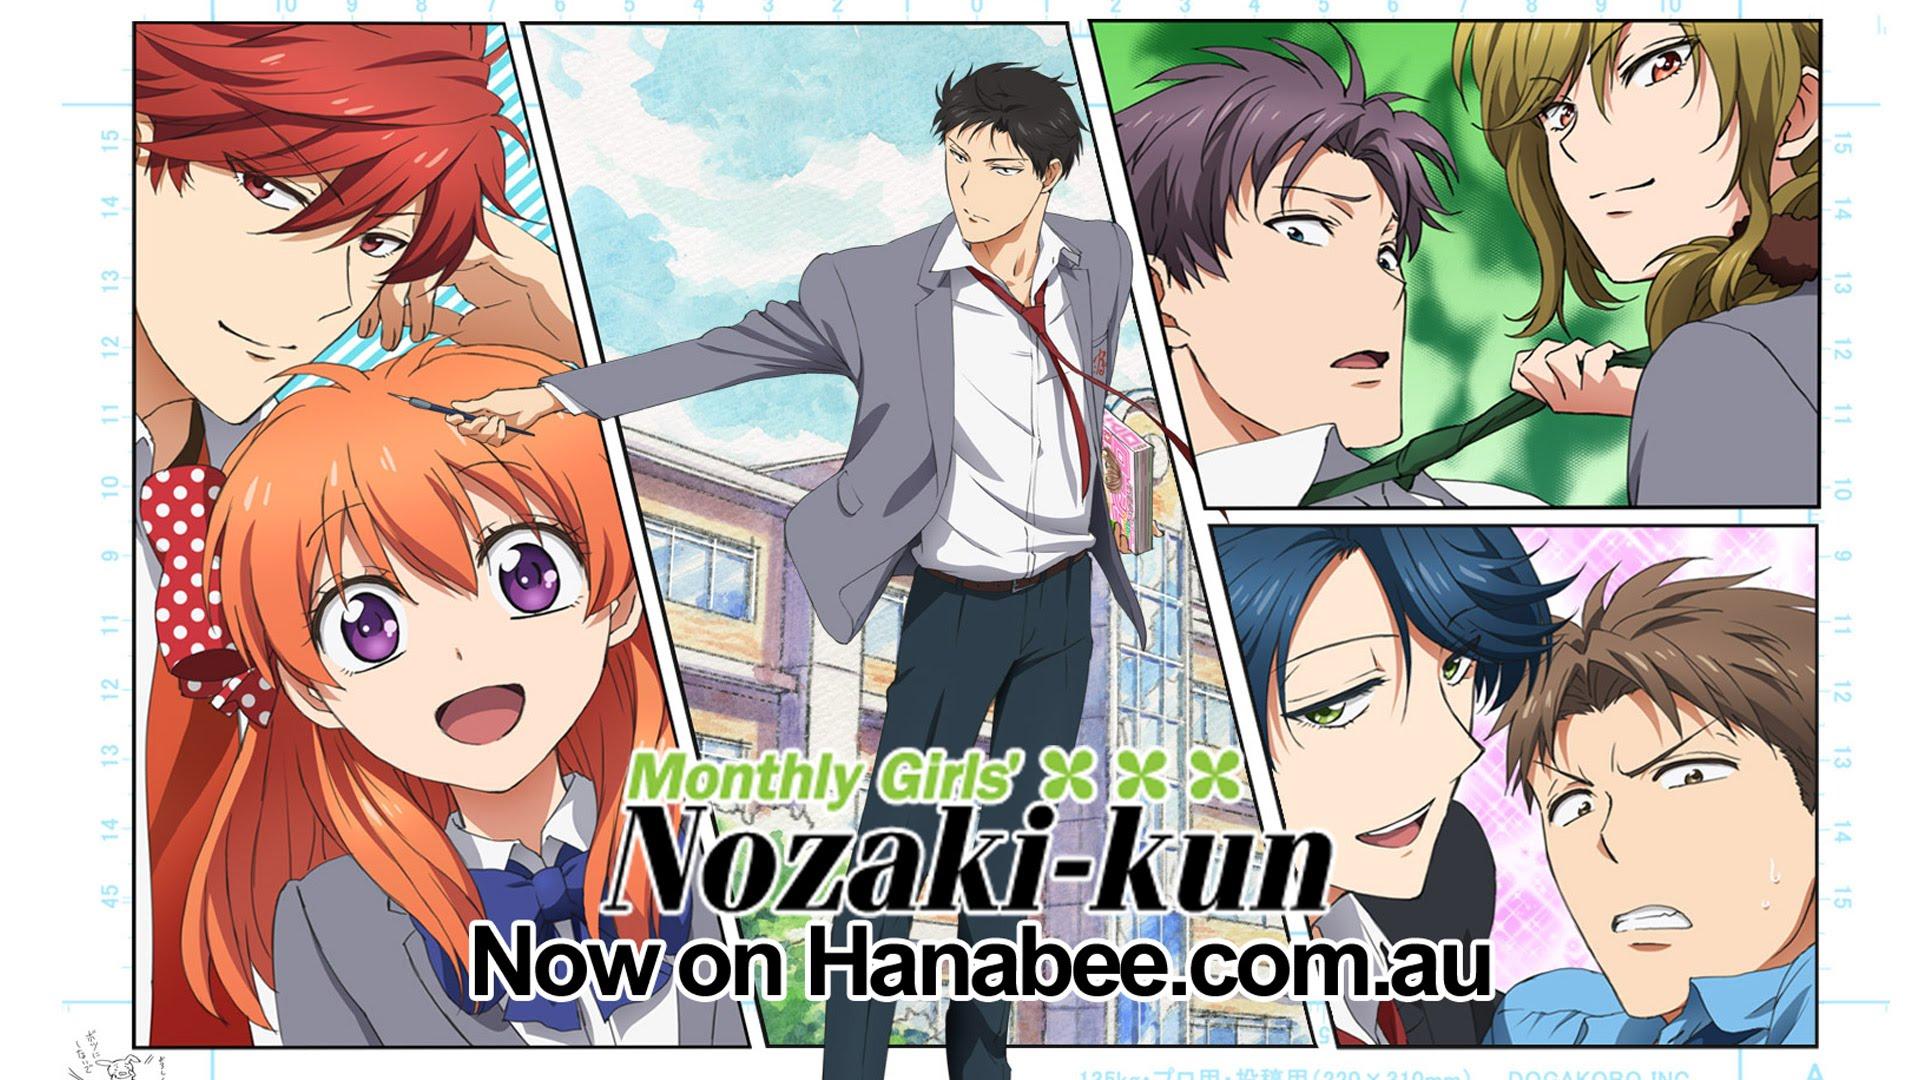 Monthly Girls Nozaki Kun Wallpapers Anime Hq Monthly Girls